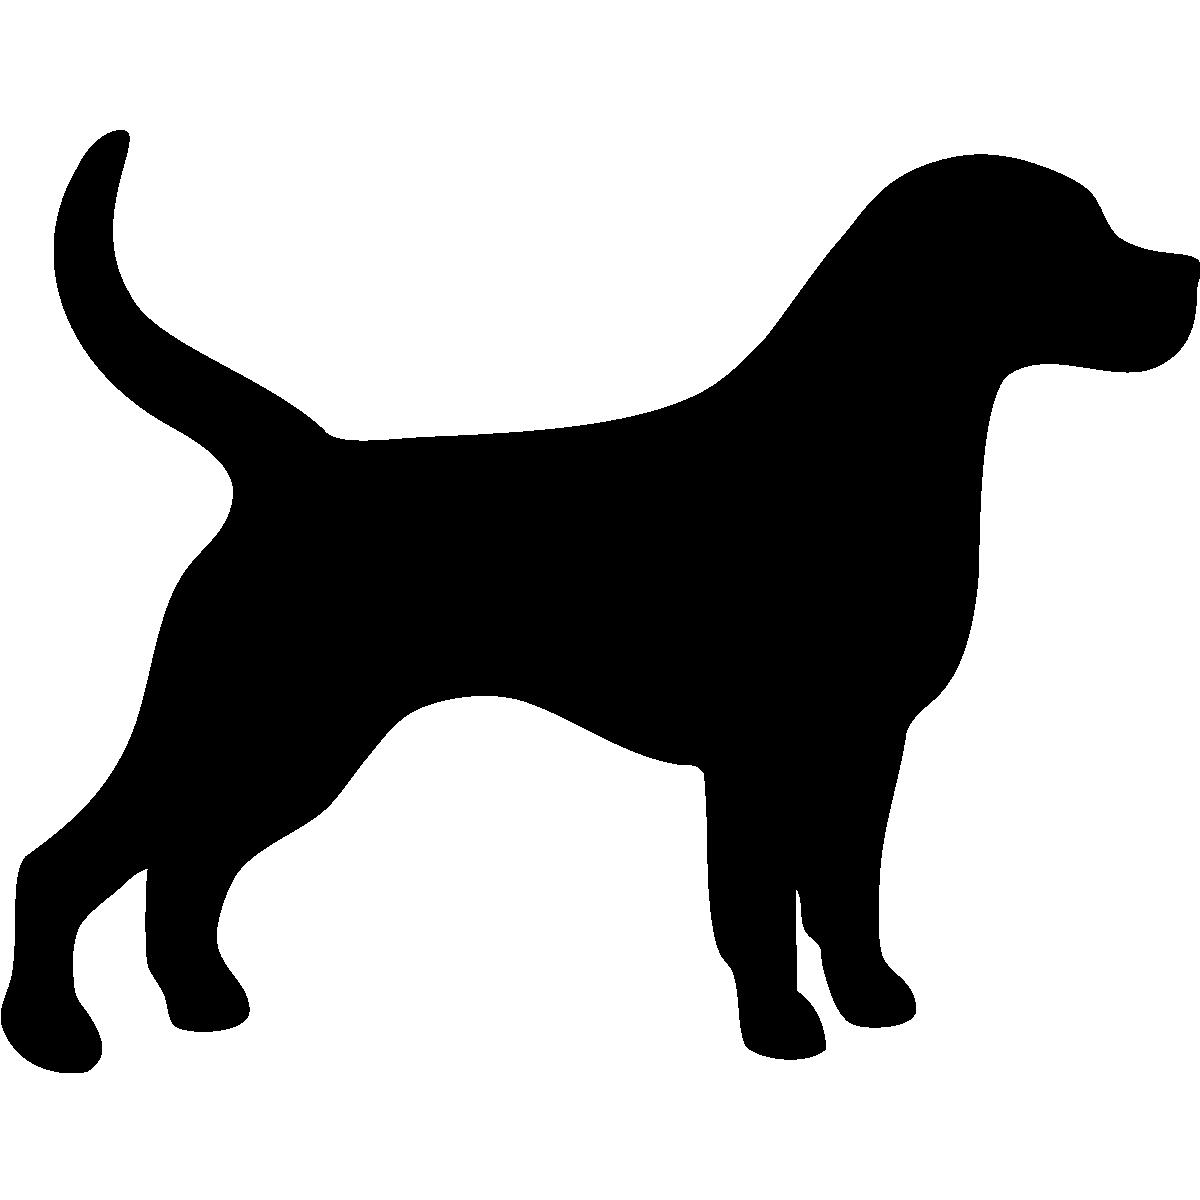 stickers tableaux et ardoises sticker ardoise silhouette chien ambiance. Black Bedroom Furniture Sets. Home Design Ideas